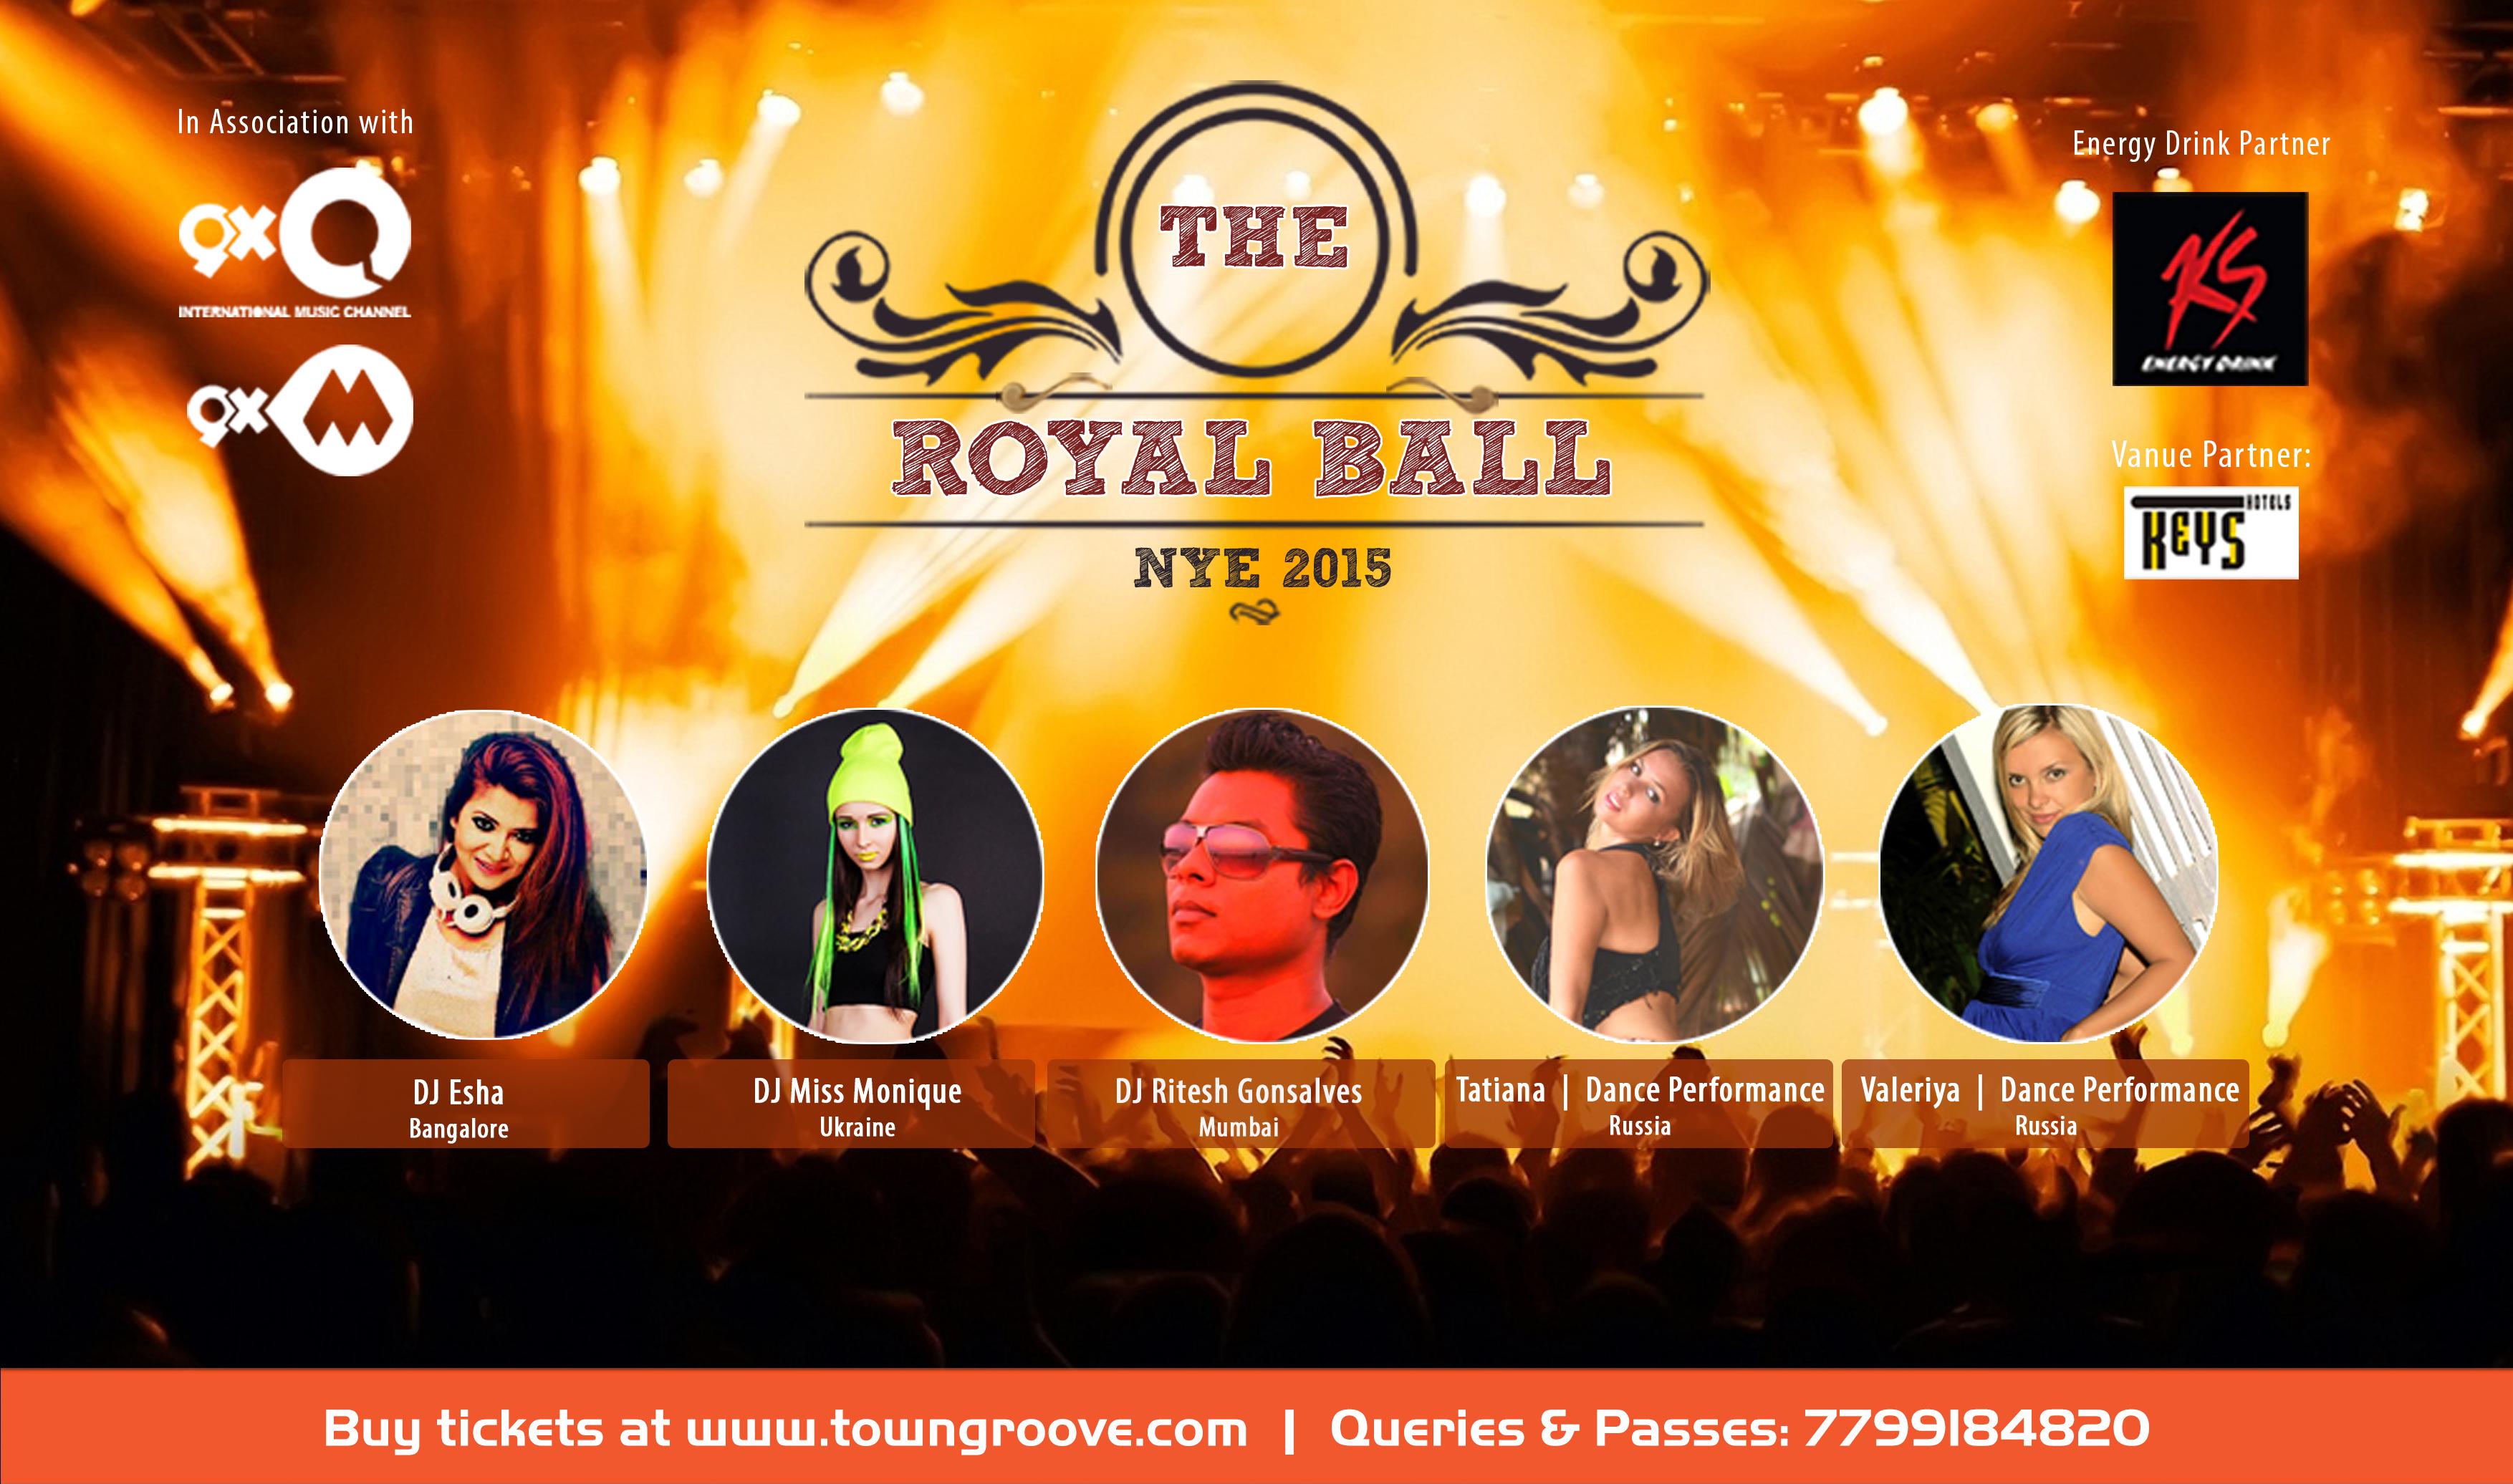 Royal-ball-a4-high-resolution